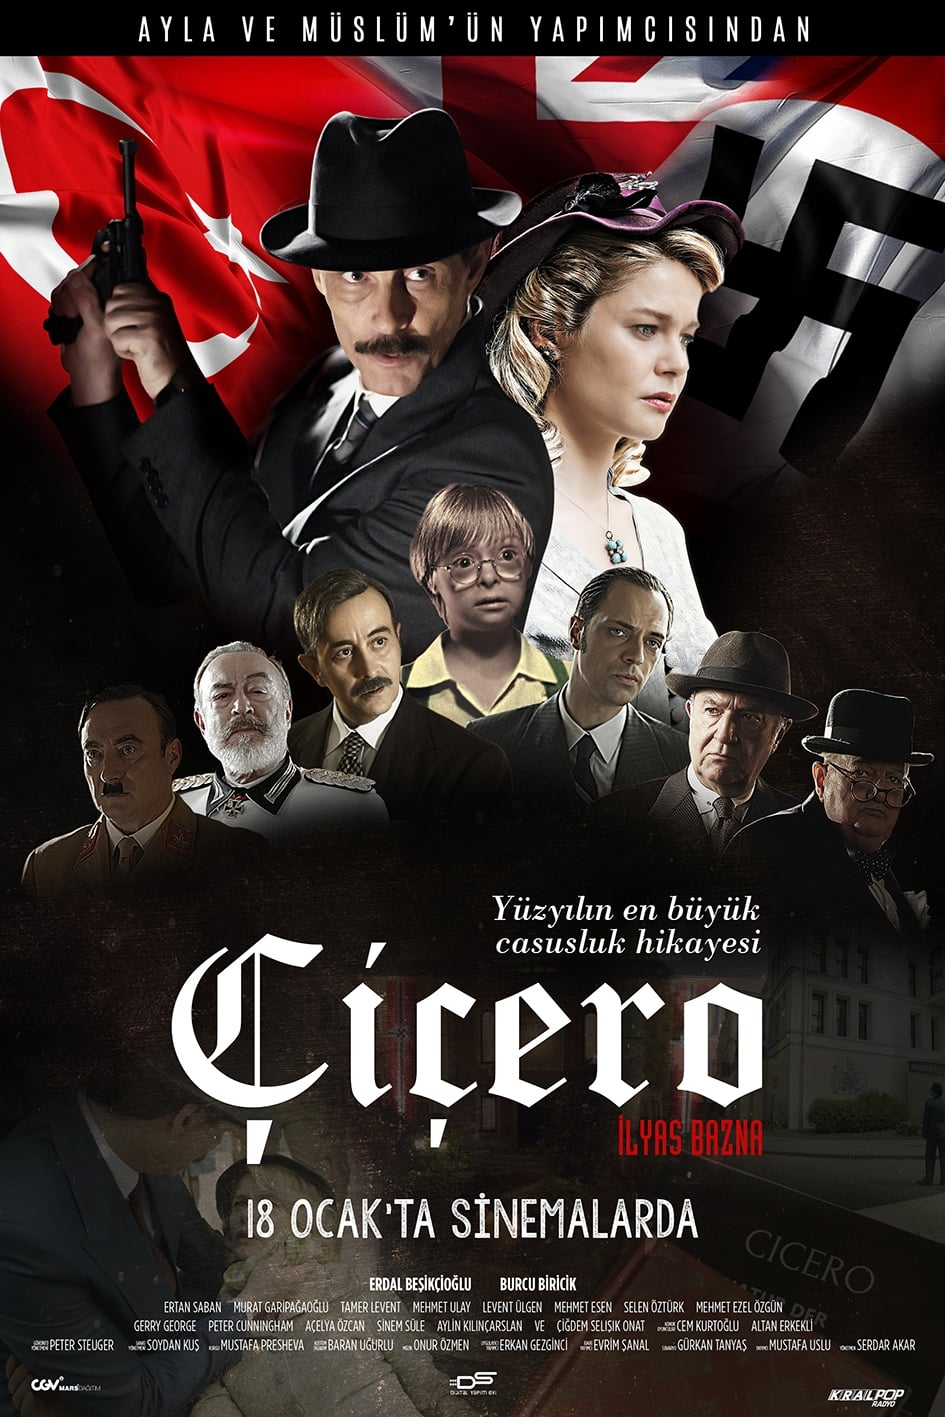 watch Çiçero 2019 Stream online free